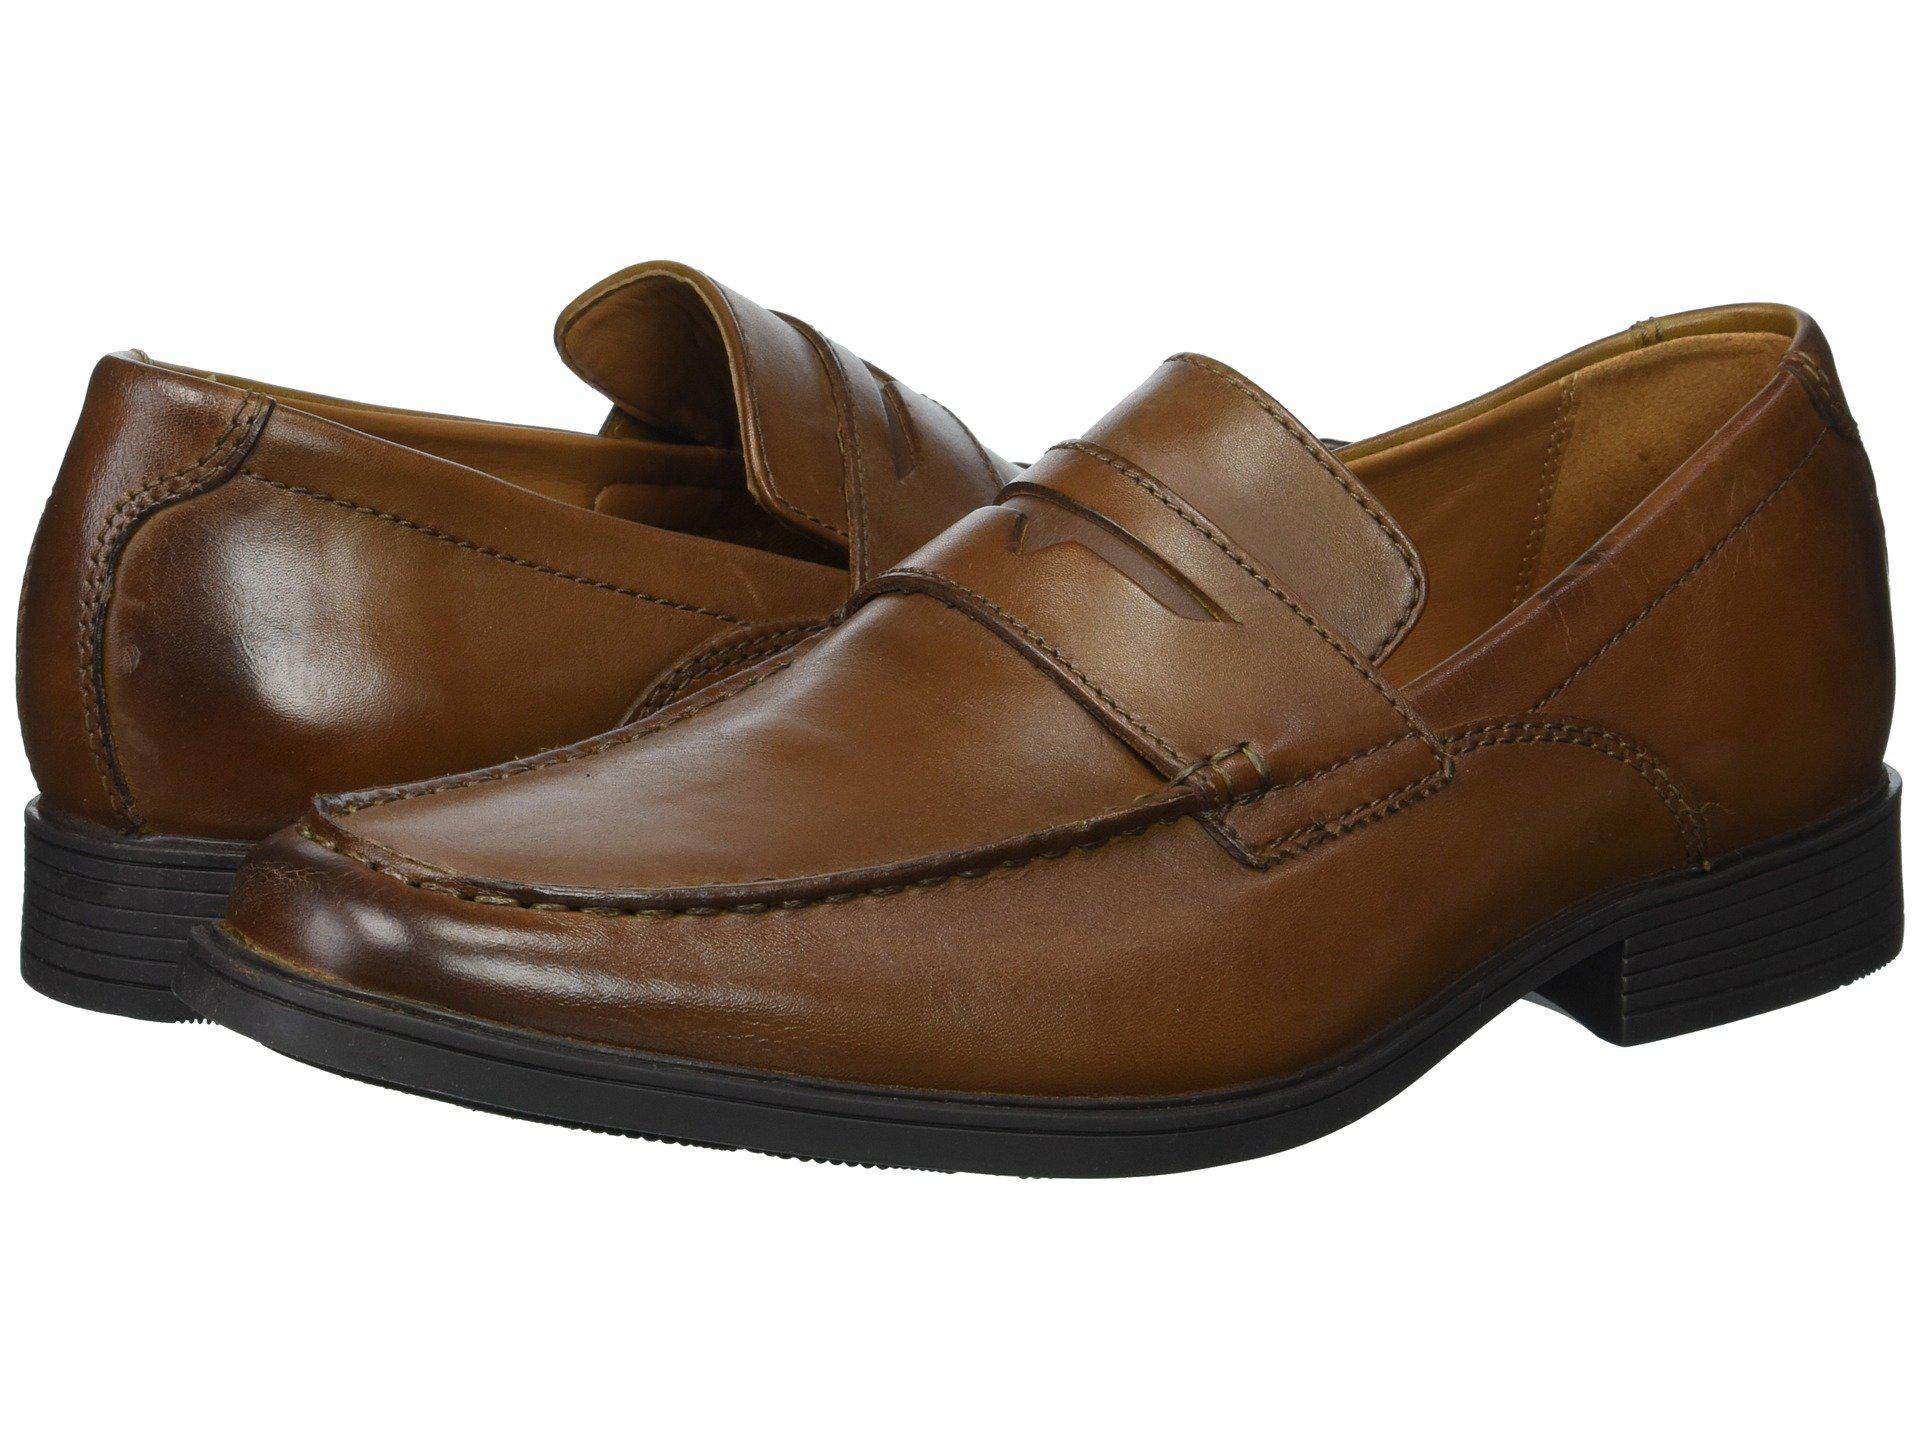 c59b584425a Clarks - Brown Tilden Way for Men - Lyst. View fullscreen